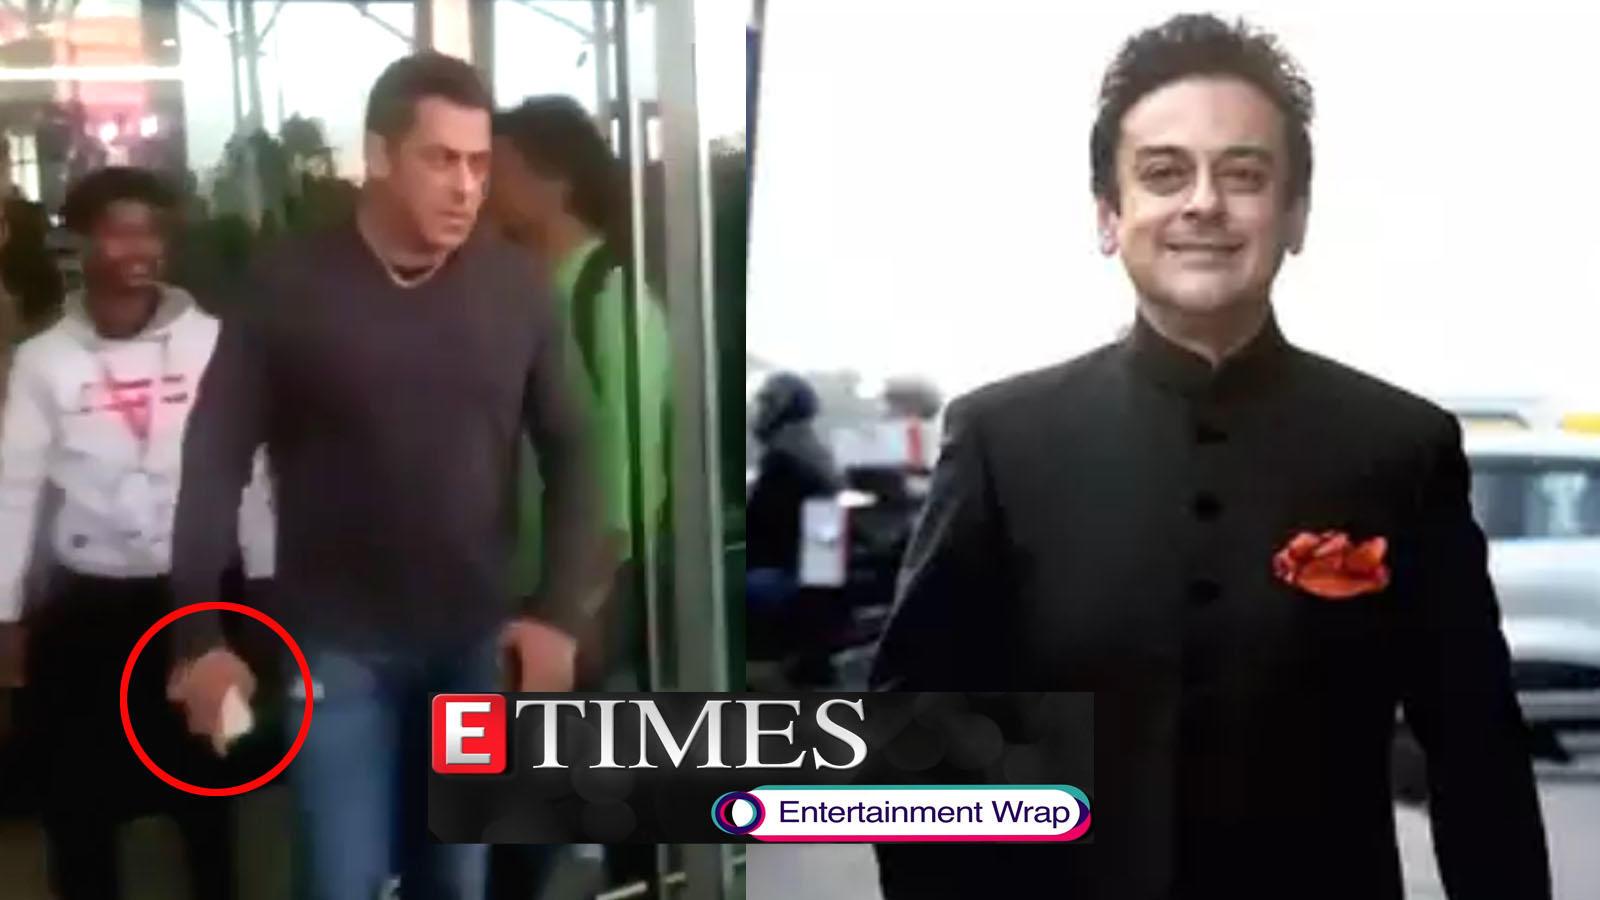 salman-khan-stuns-fan-trying-to-click-selfie-with-him-at-airport-adnan-sami-silences-politician-questioning-his-padma-award-and-more-